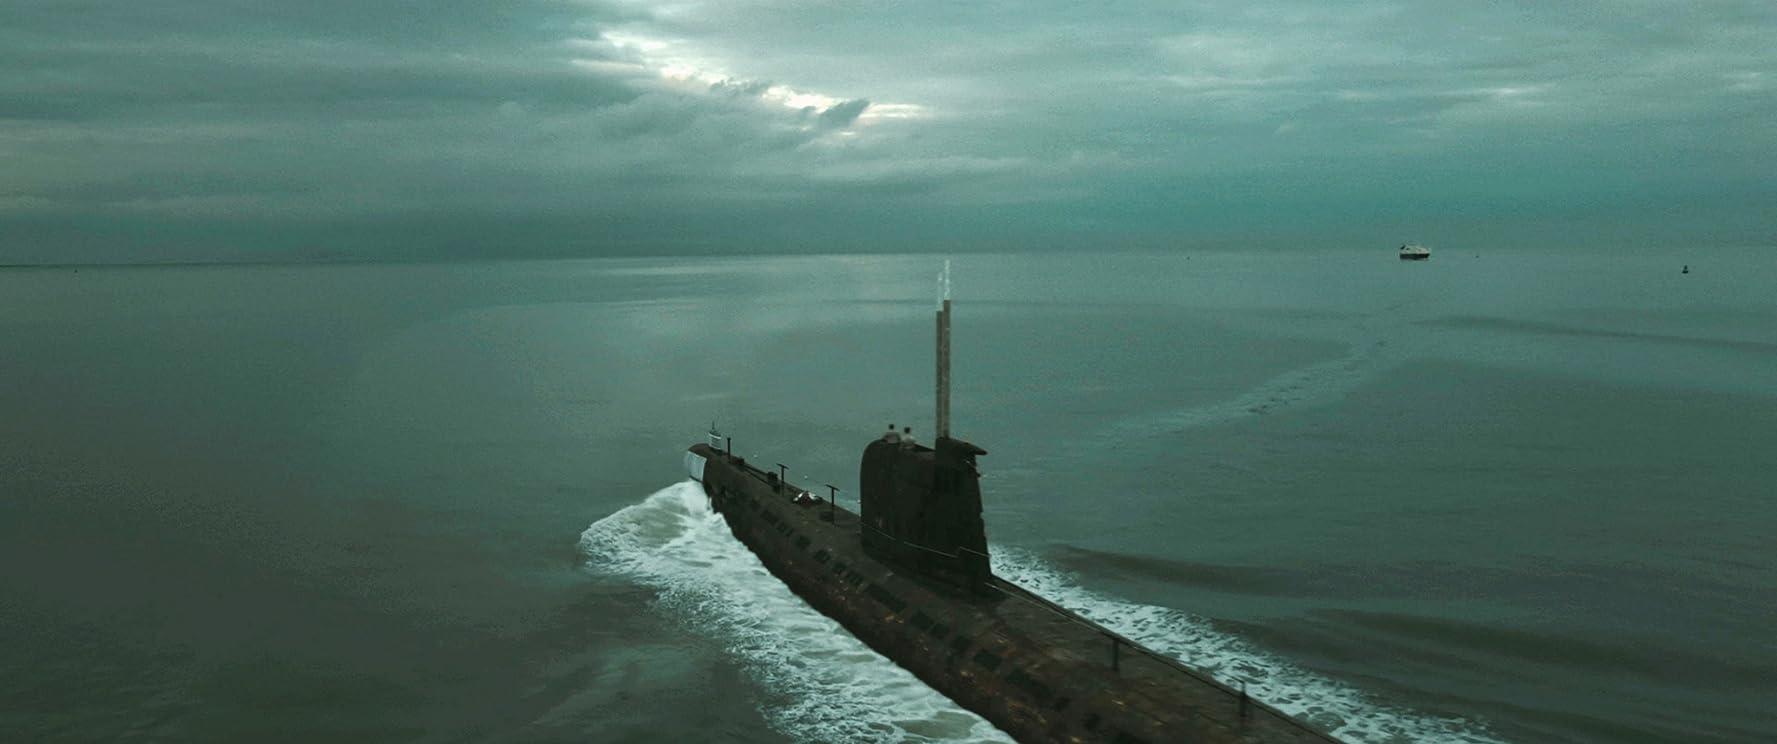 Mar Negro (Black Sea)